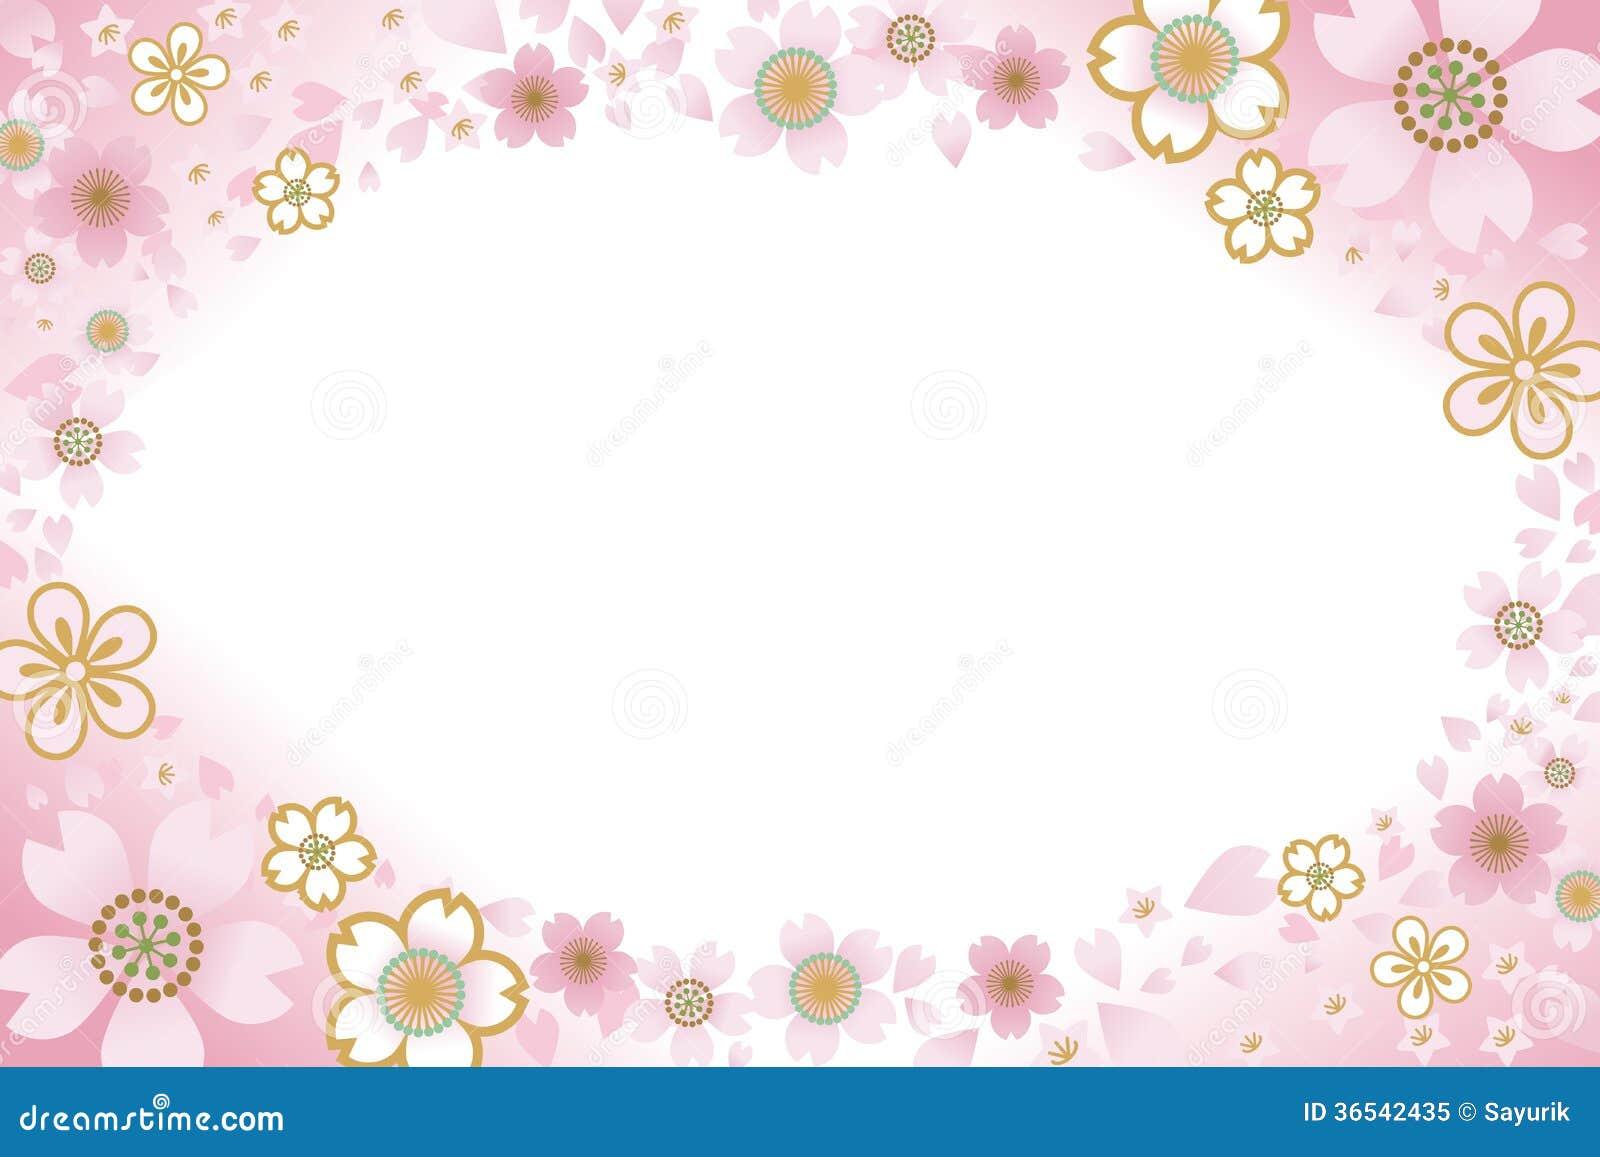 Cherry Blossom Frame Royalty Free Stock Photo Image